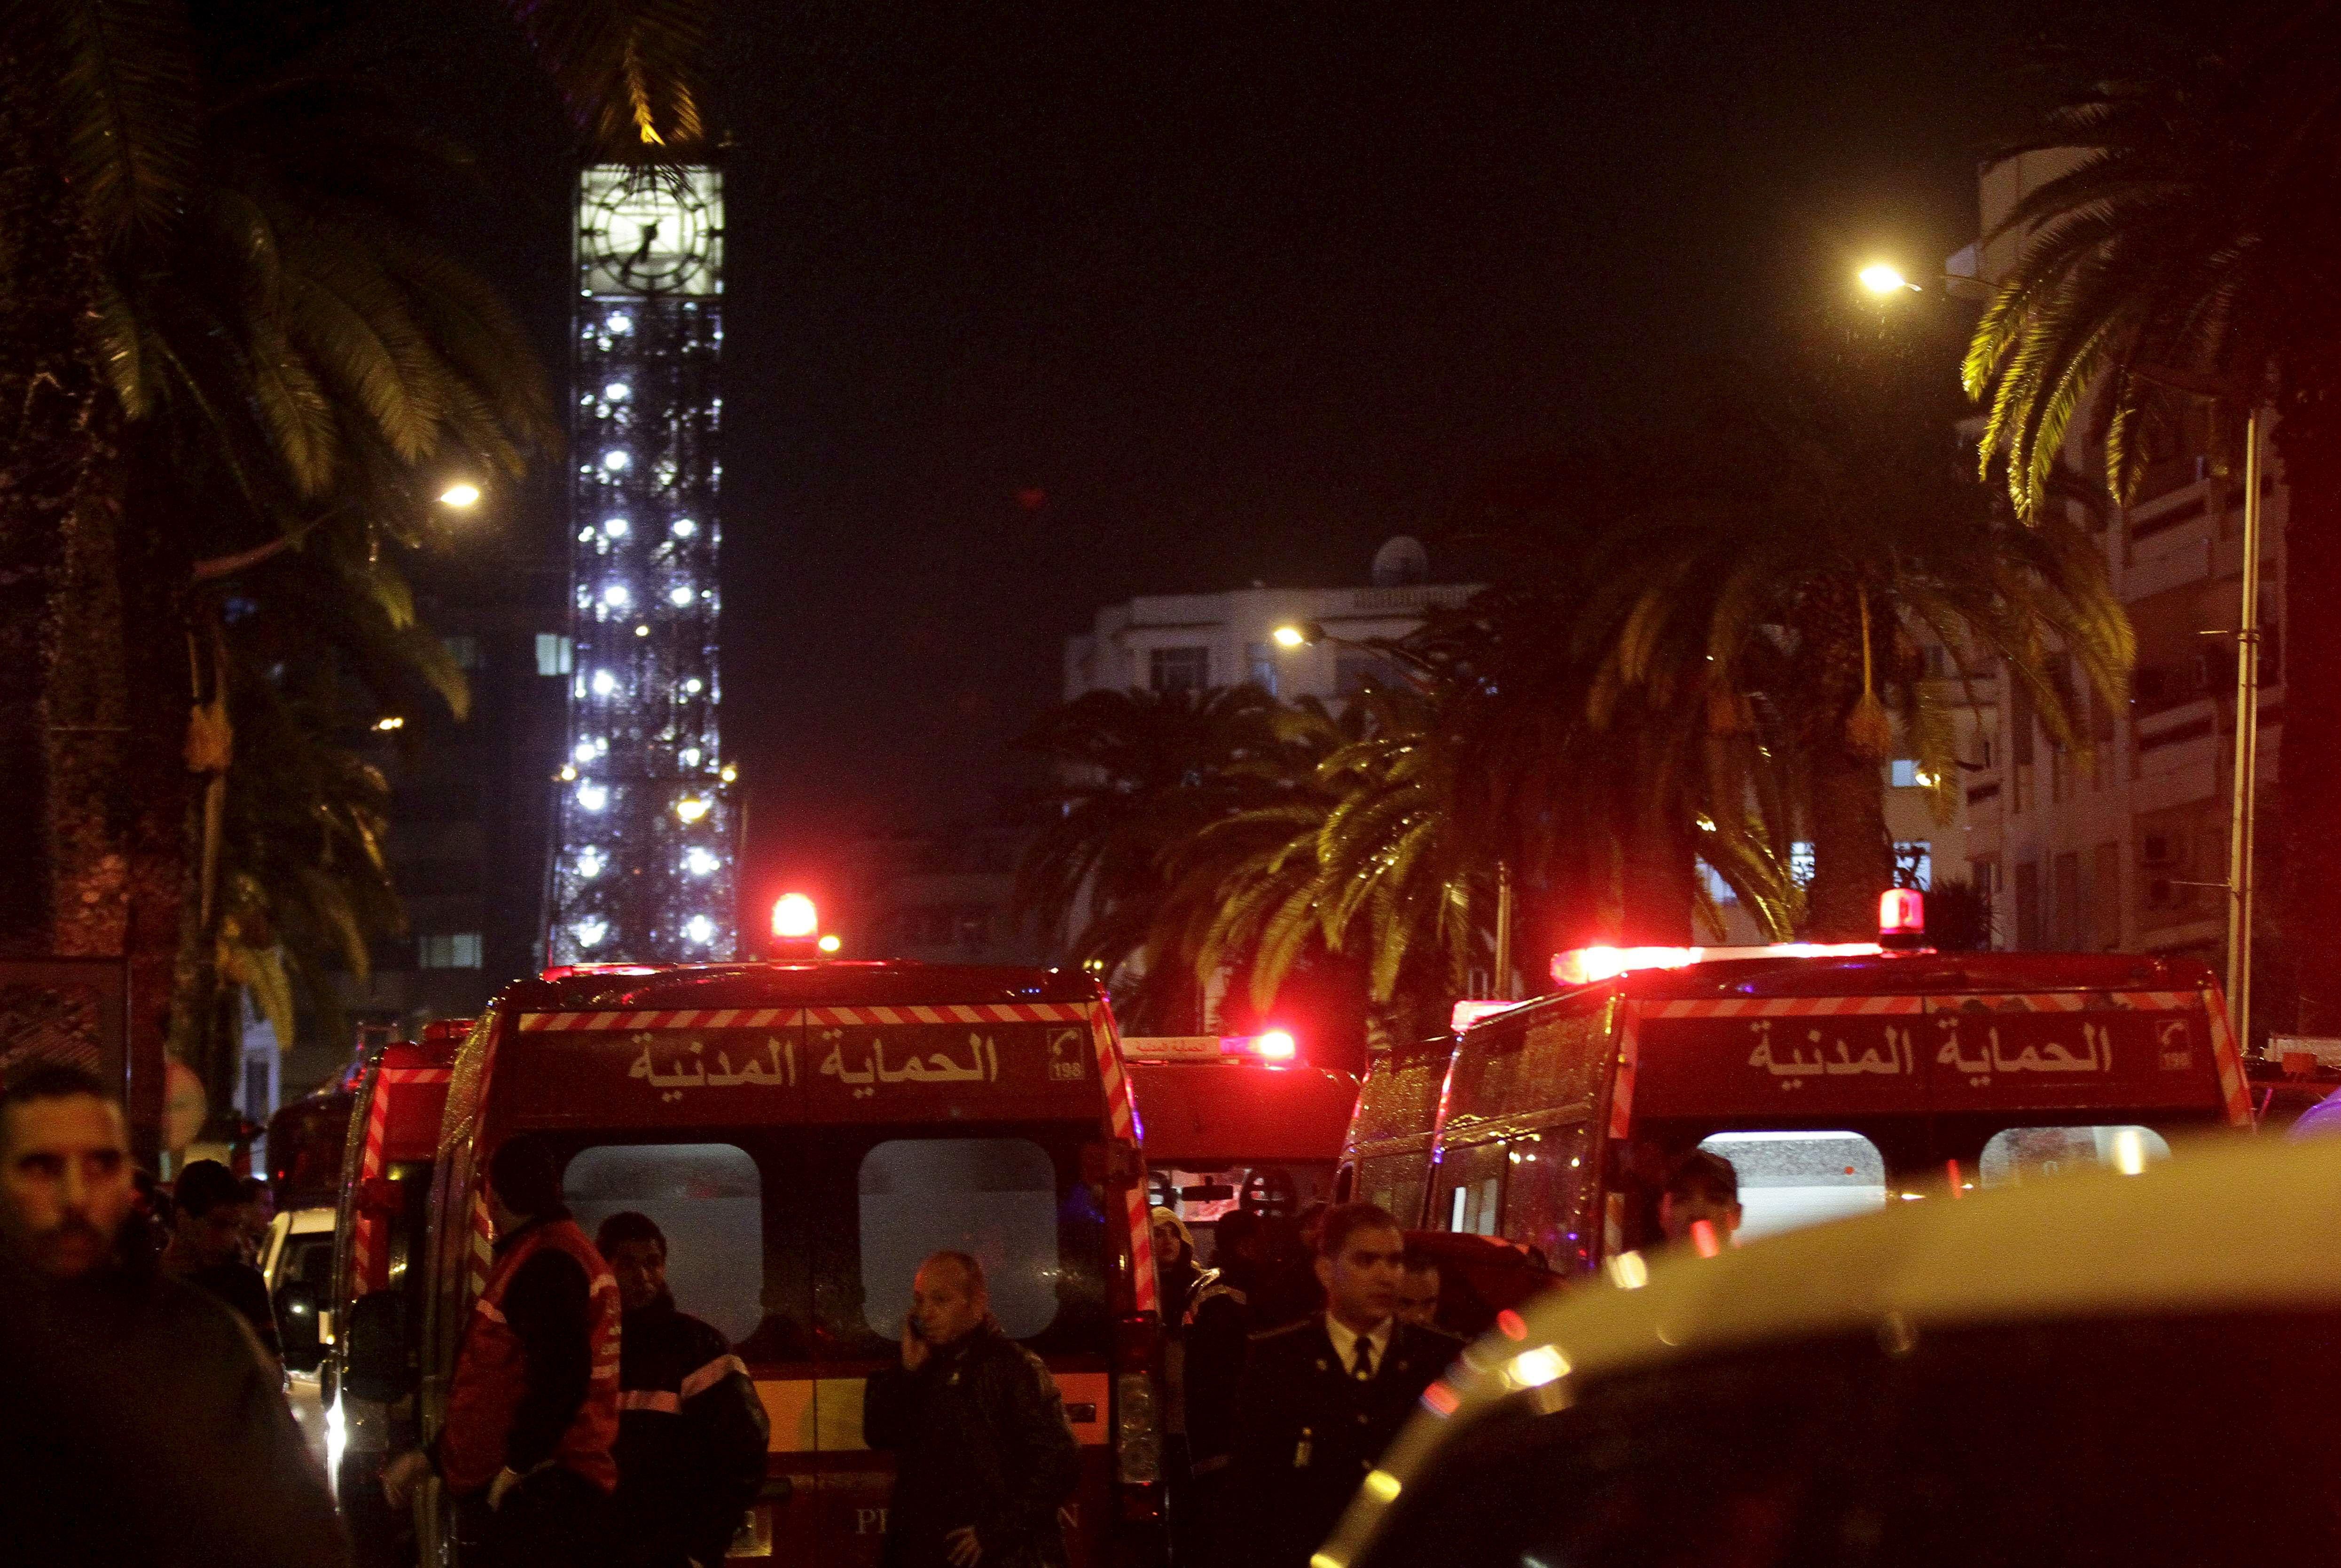 Attentat de Tunis : l'Etat islamique revendique l'attaque